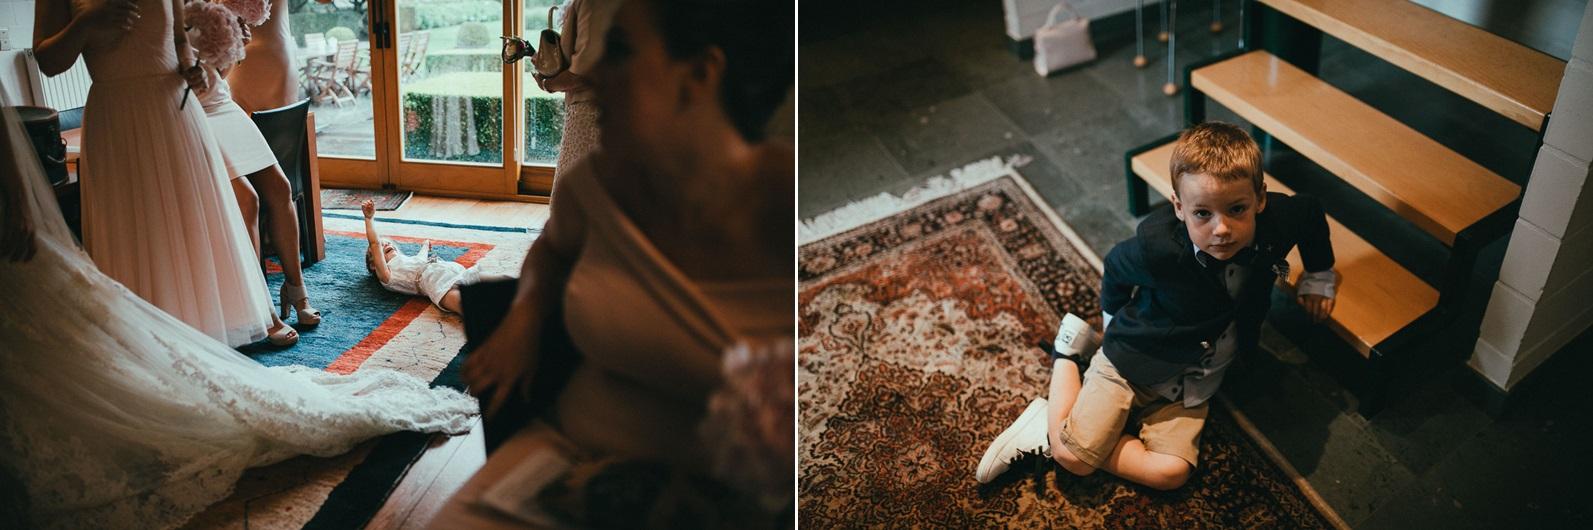 chateau-wedding-photography (36).jpg